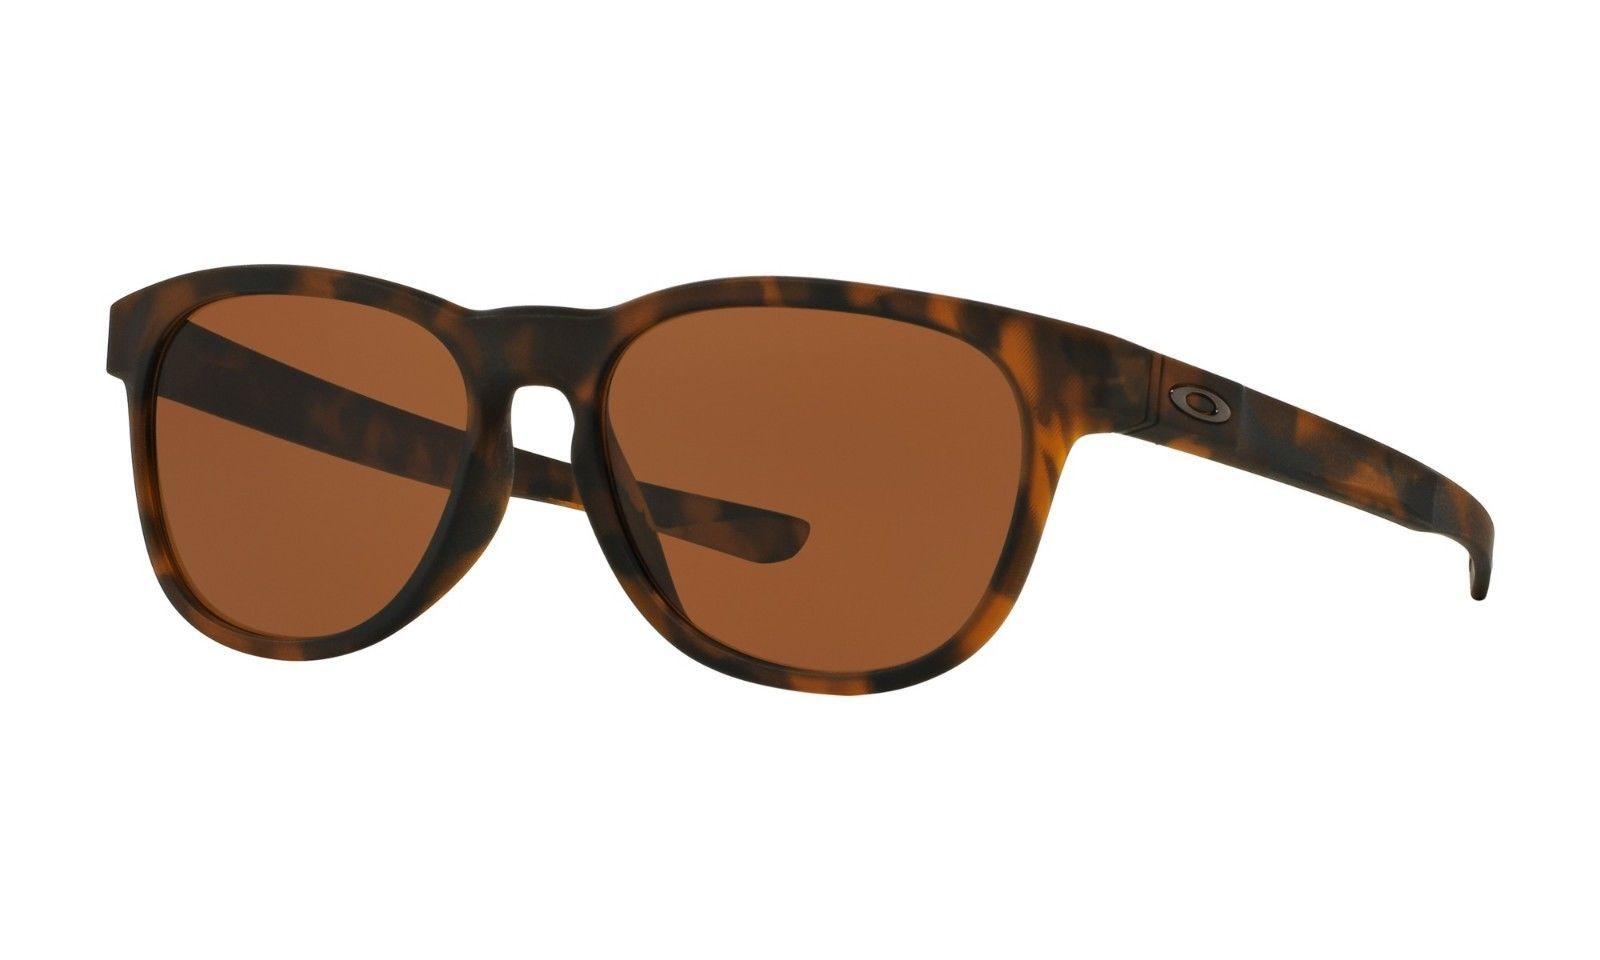 Oakley Stringer Sunglasses OO9315-02 Matte Brown Frame W/ Dark Bronze DEFECT